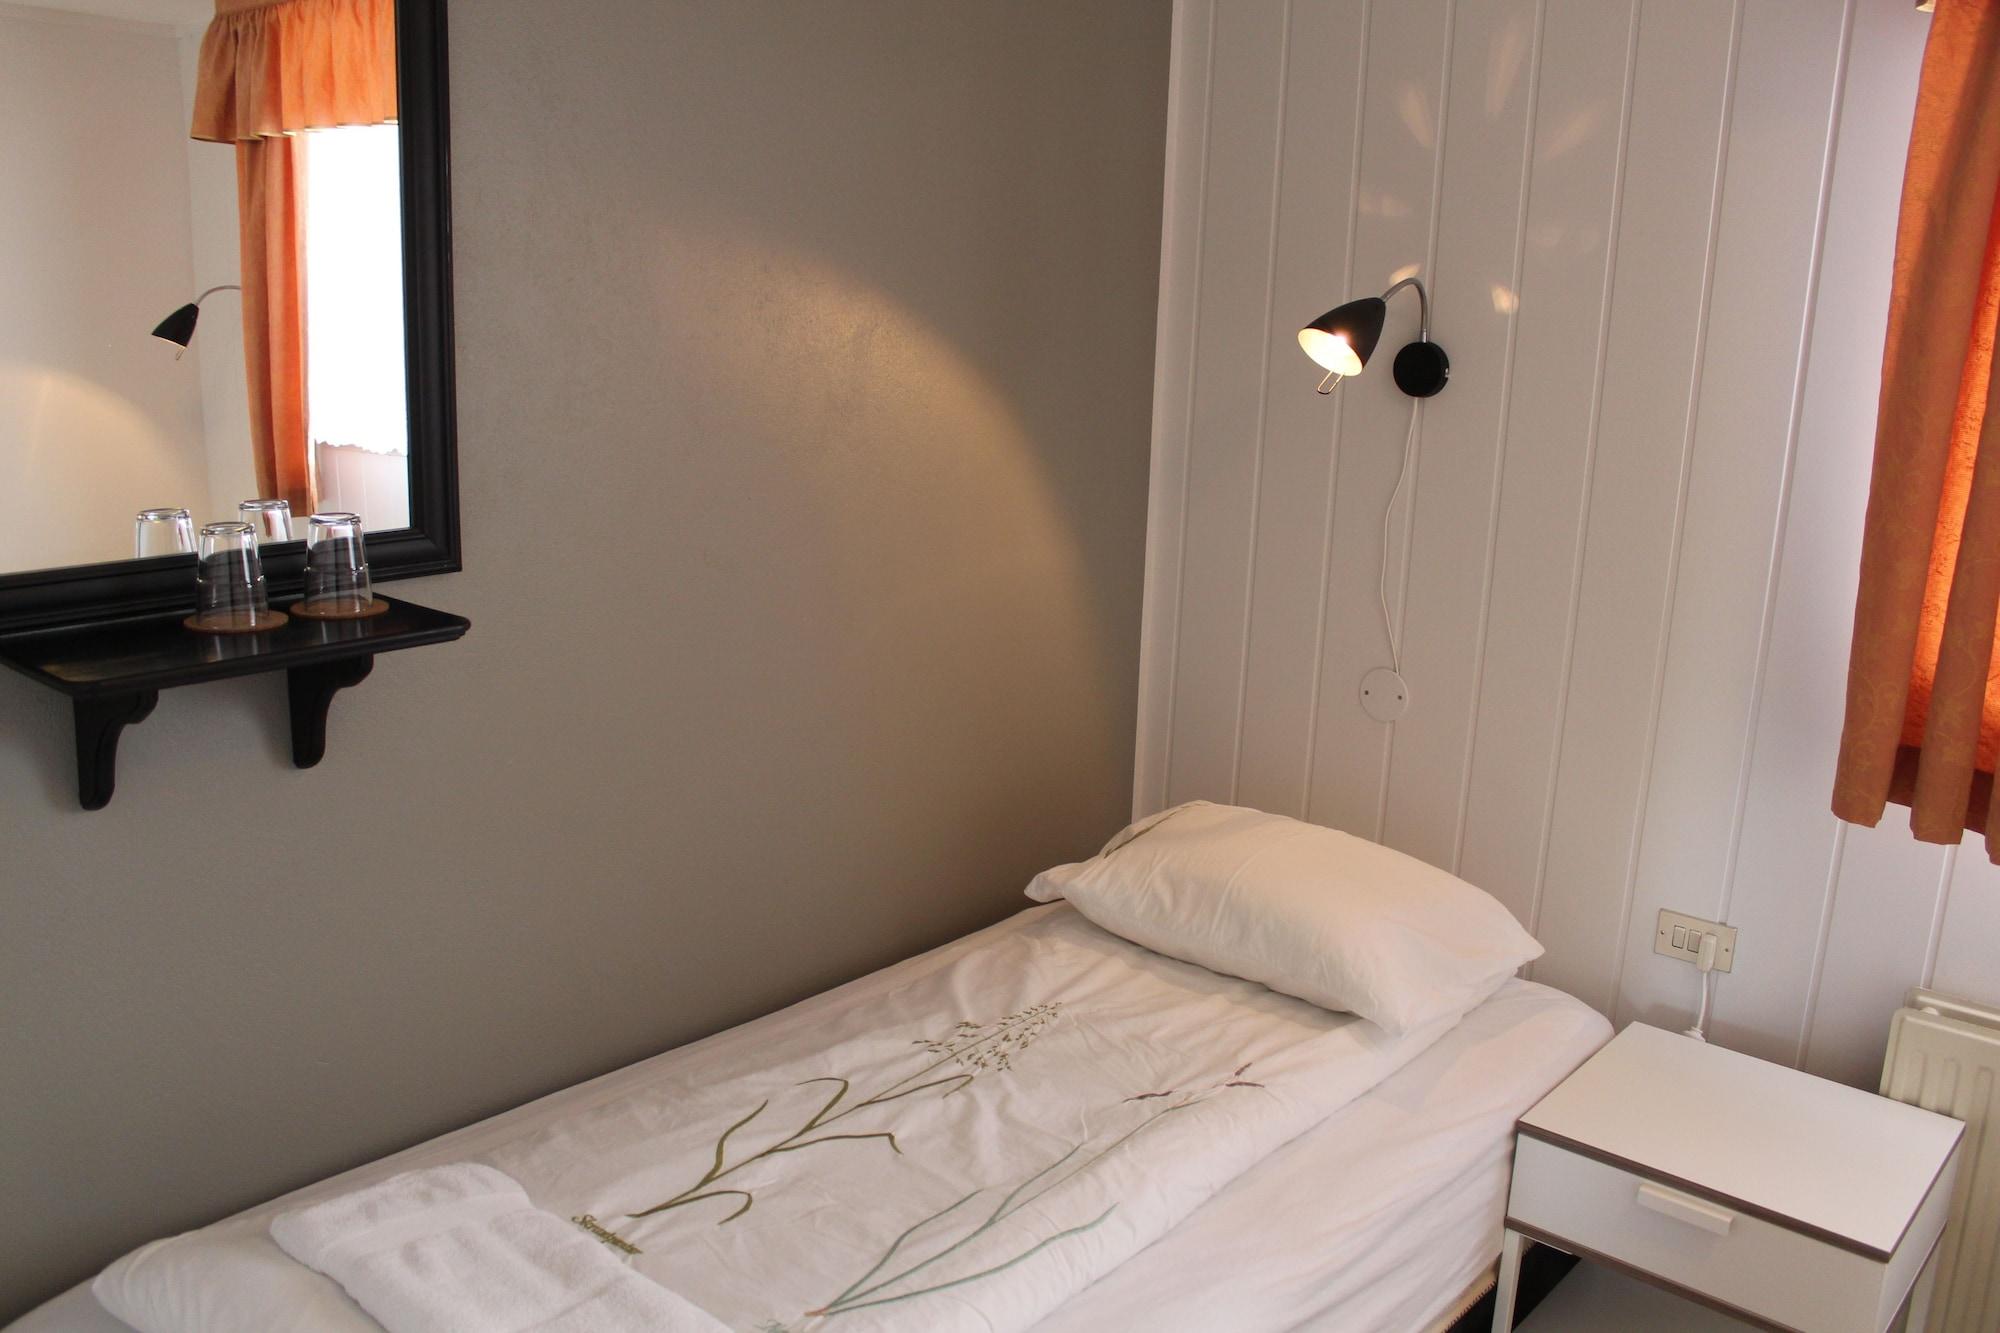 Lónsá Guesthouse, Akureyri